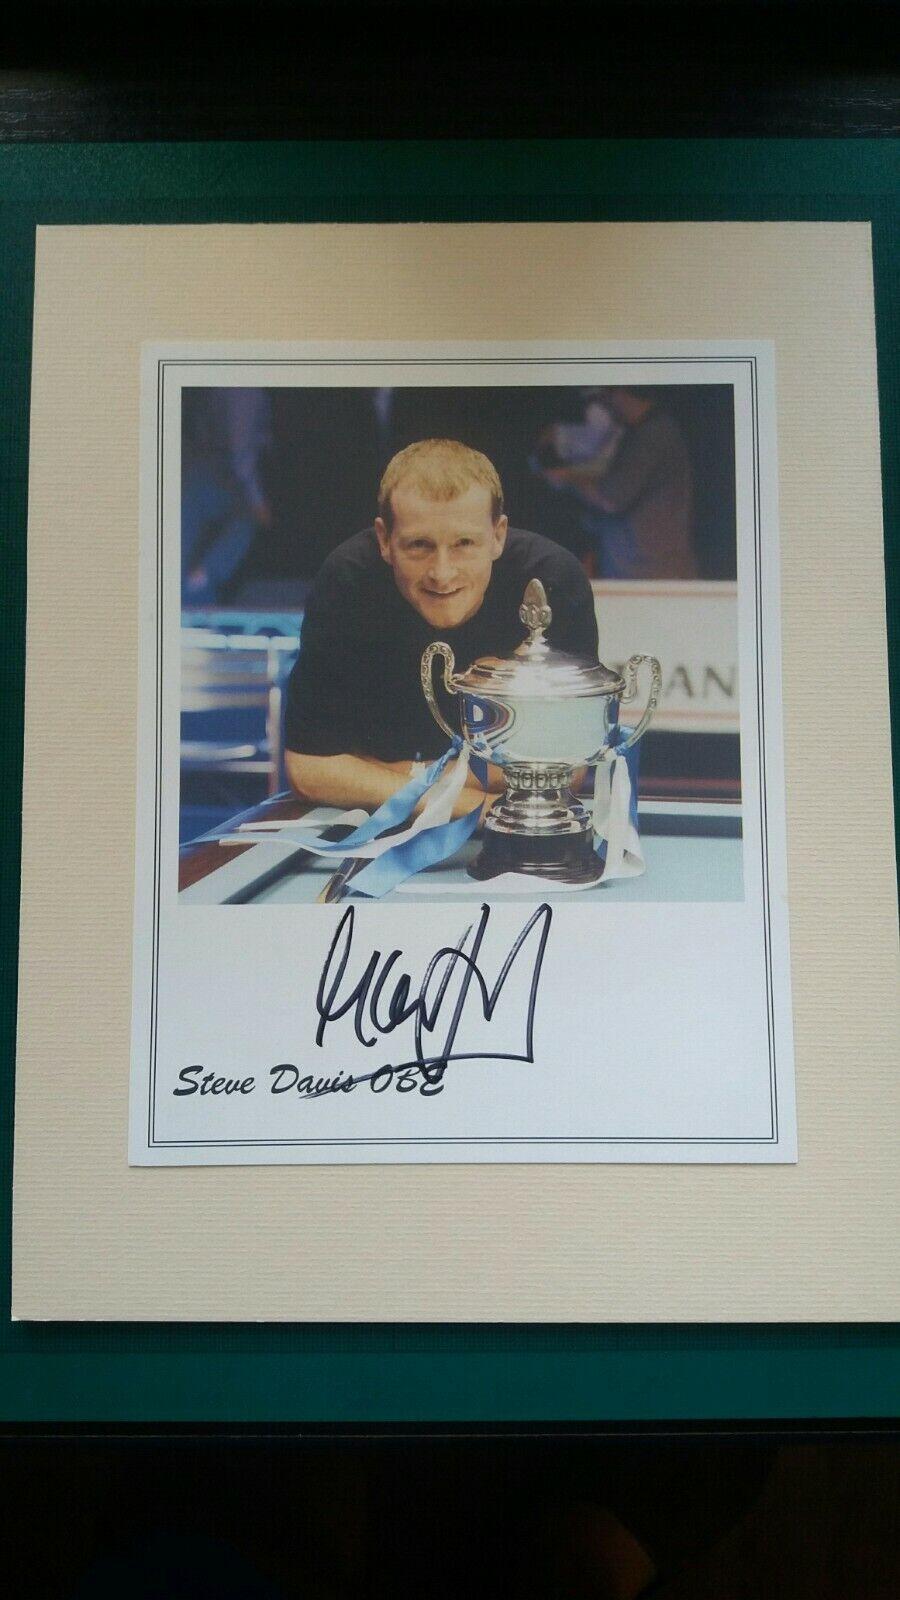 HAND SIGNED 7x5 PROMO CARD  - Steve DAVIS - SNOOKER World Champion